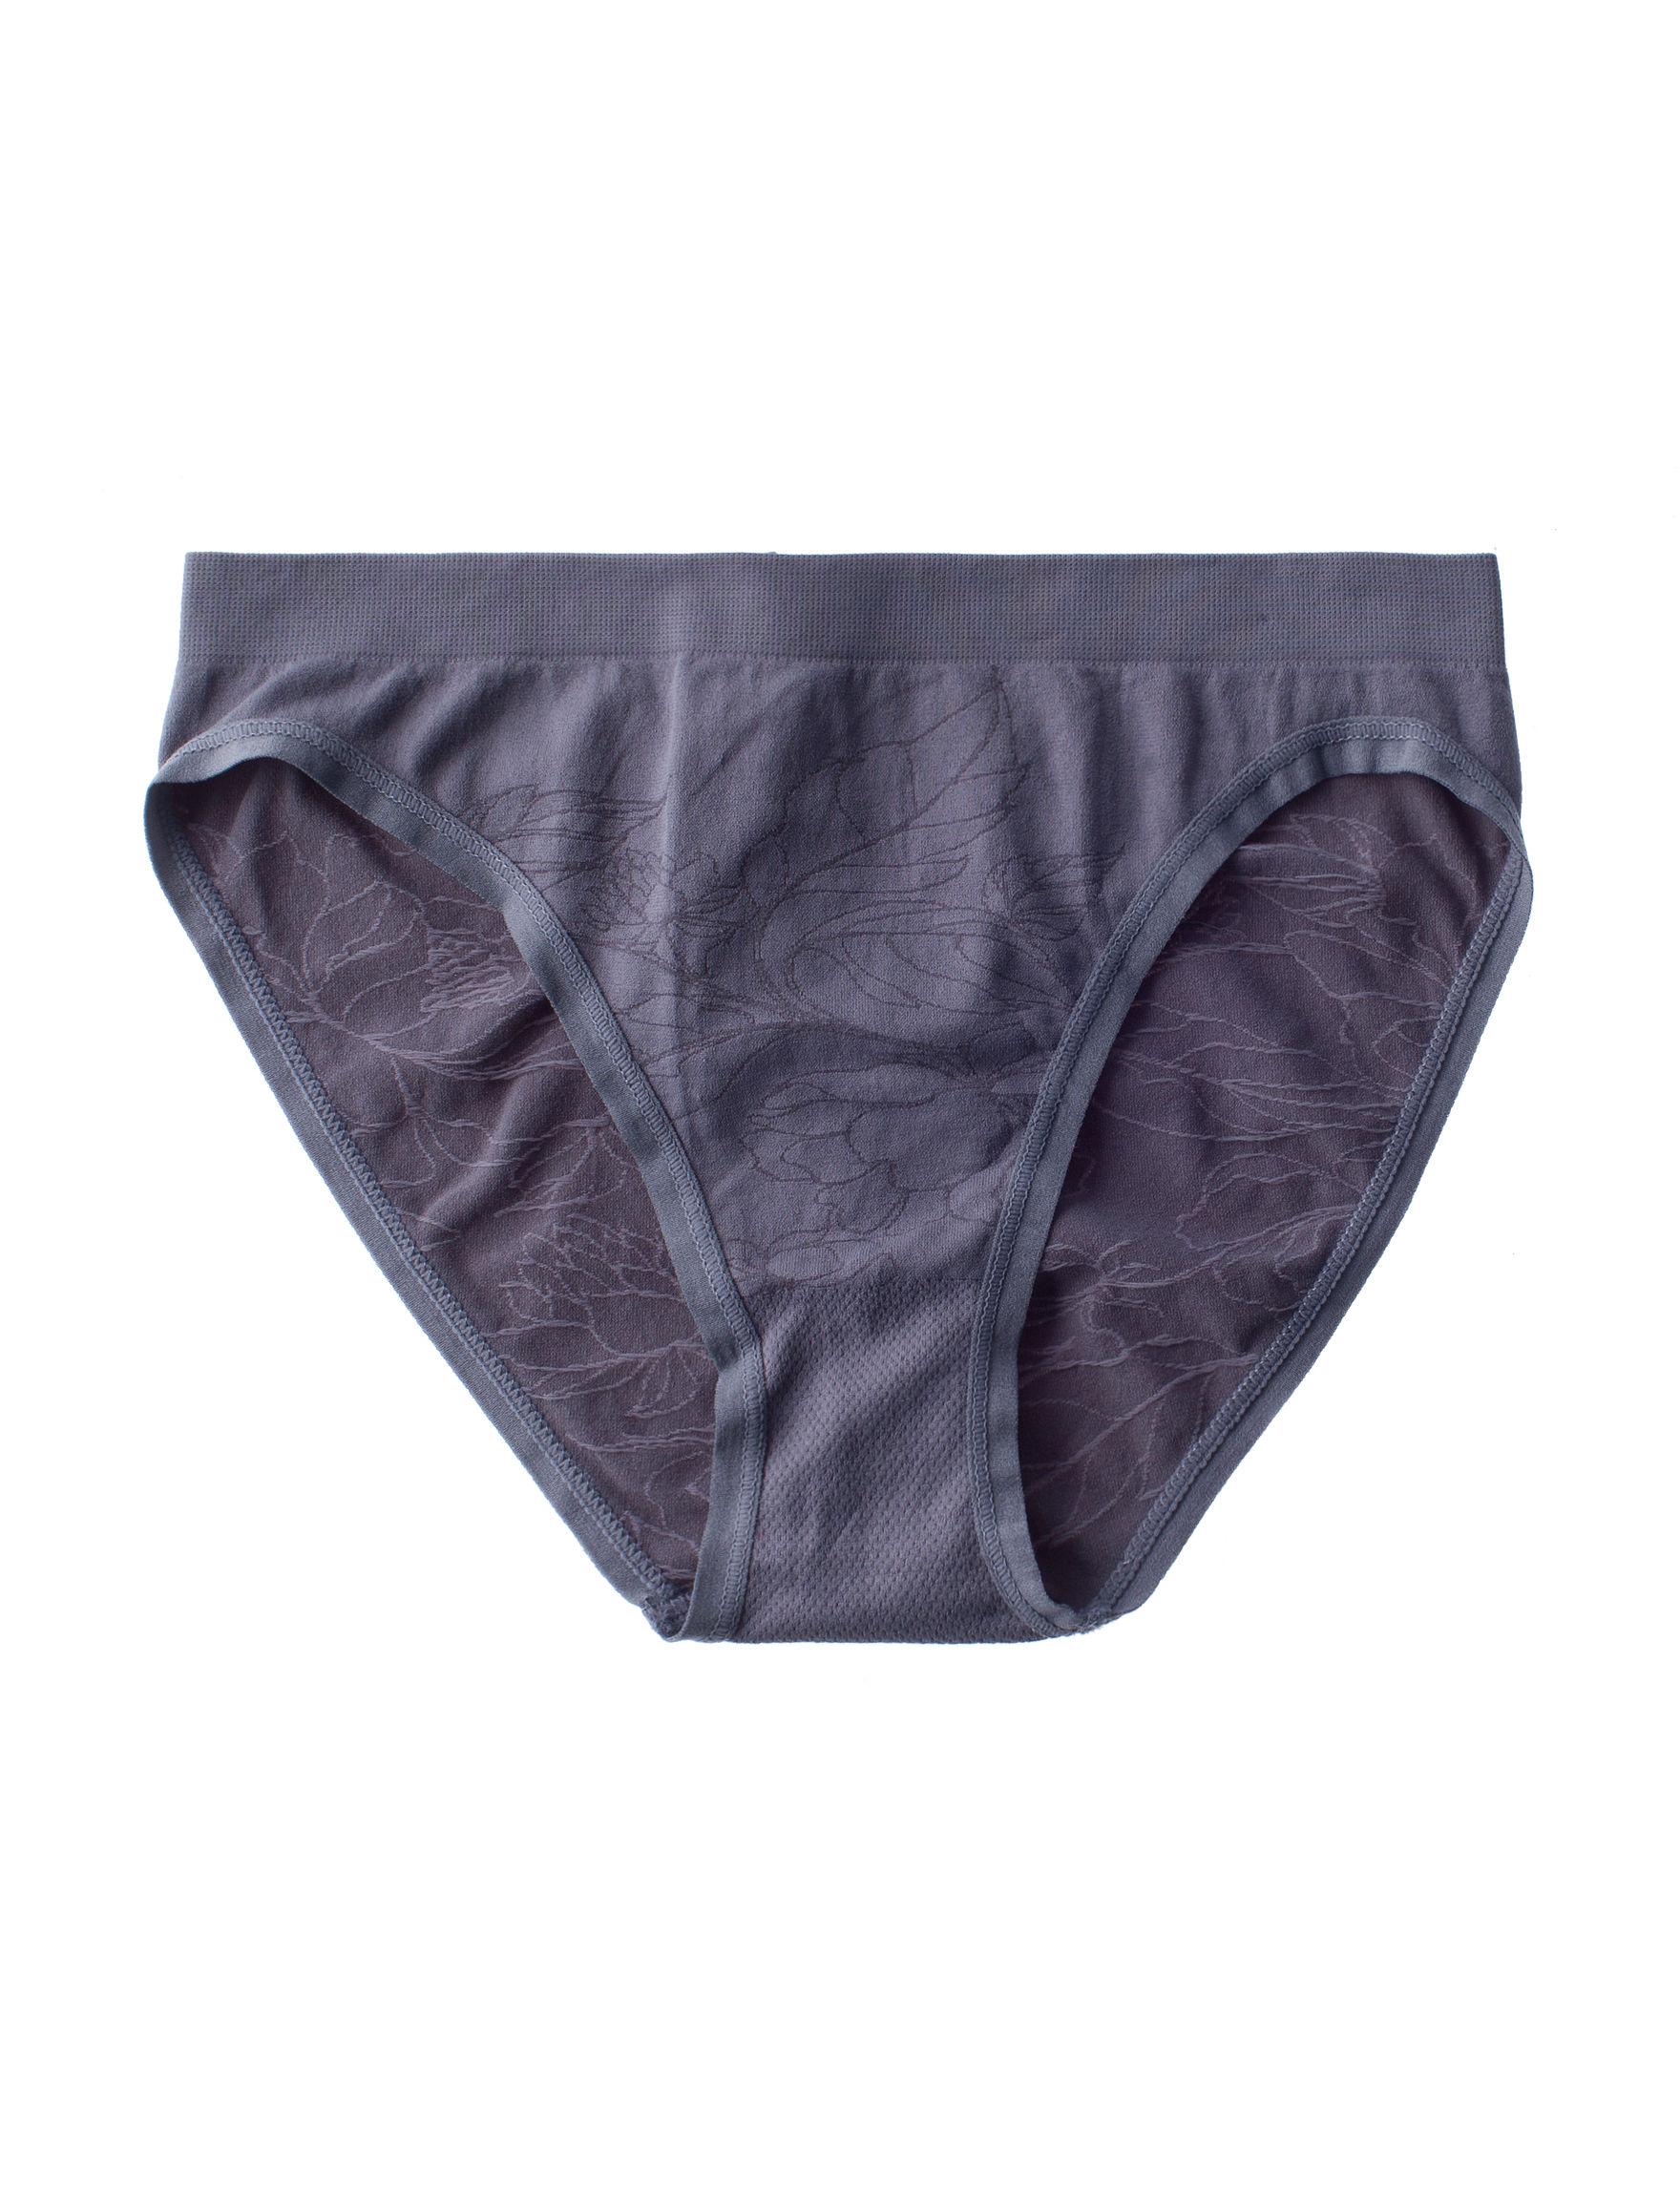 Rene Rofe Grey Panties Briefs High Cut Seamless